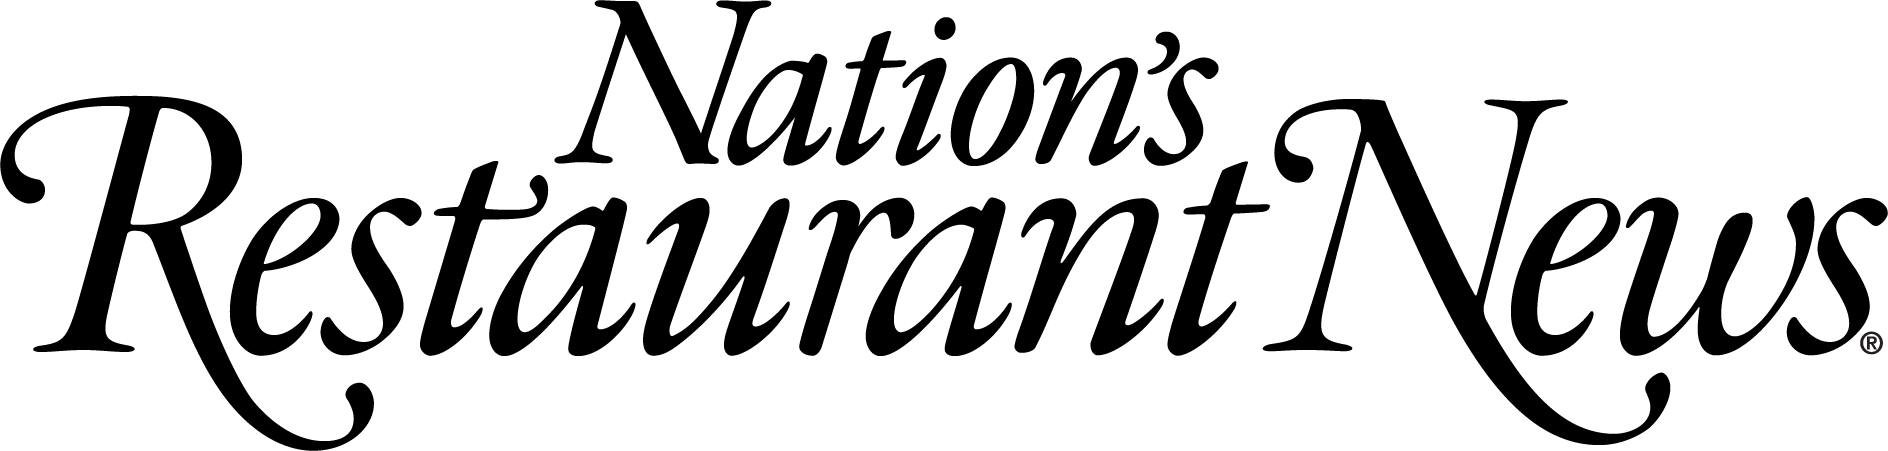 nations_restaurant_news_logo.png